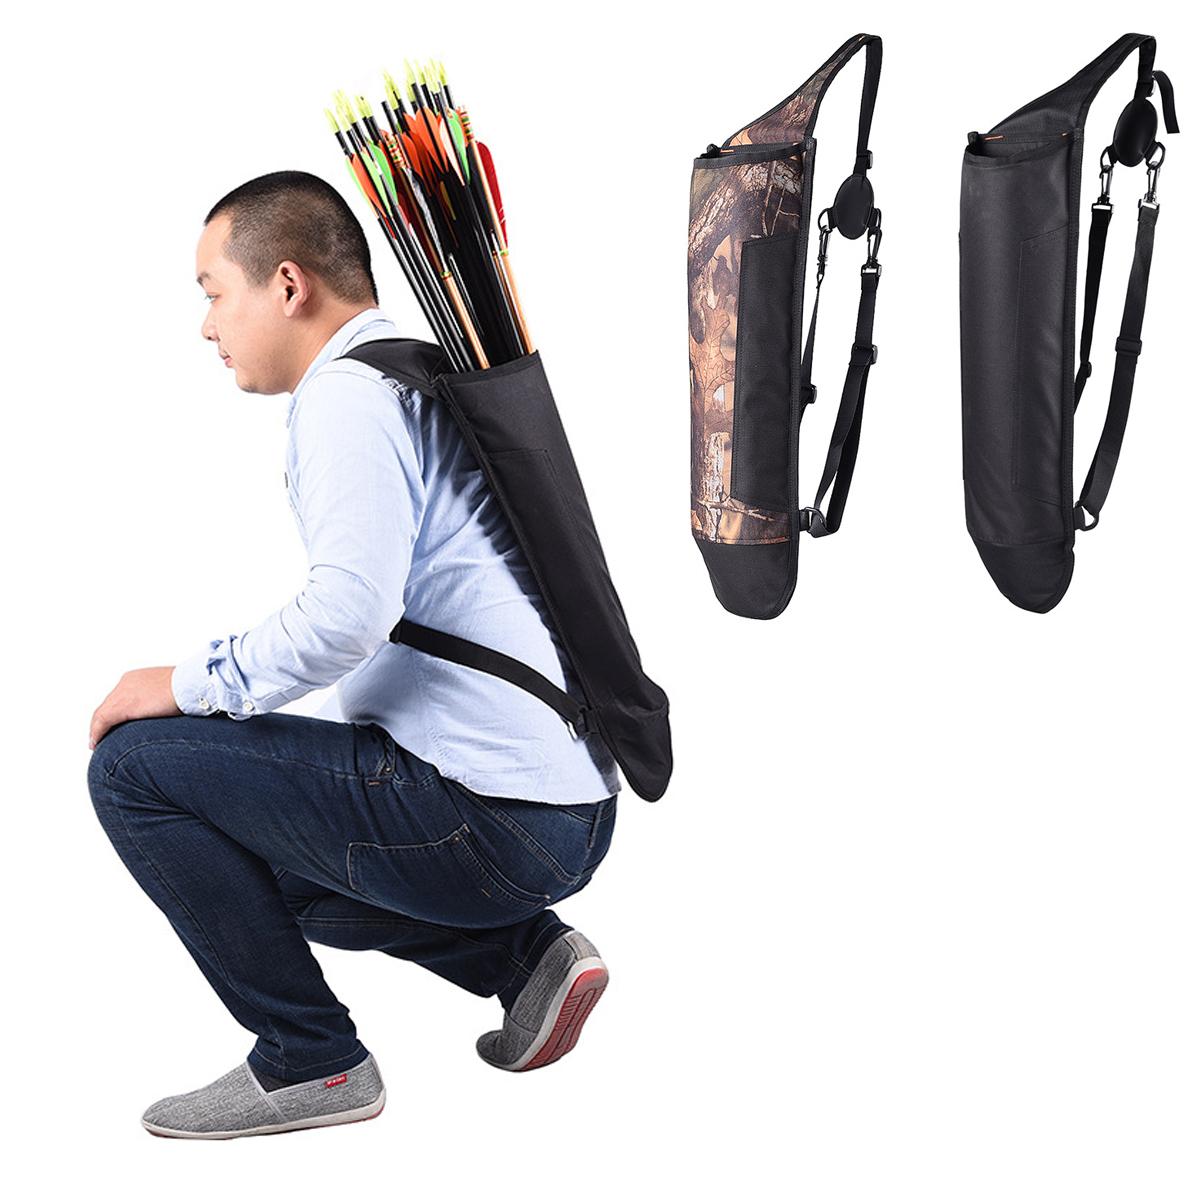 Hot Hunting Back Arrow Quiver Archery Bow Holder Shoulder Belt Bag Pouch Outdoor